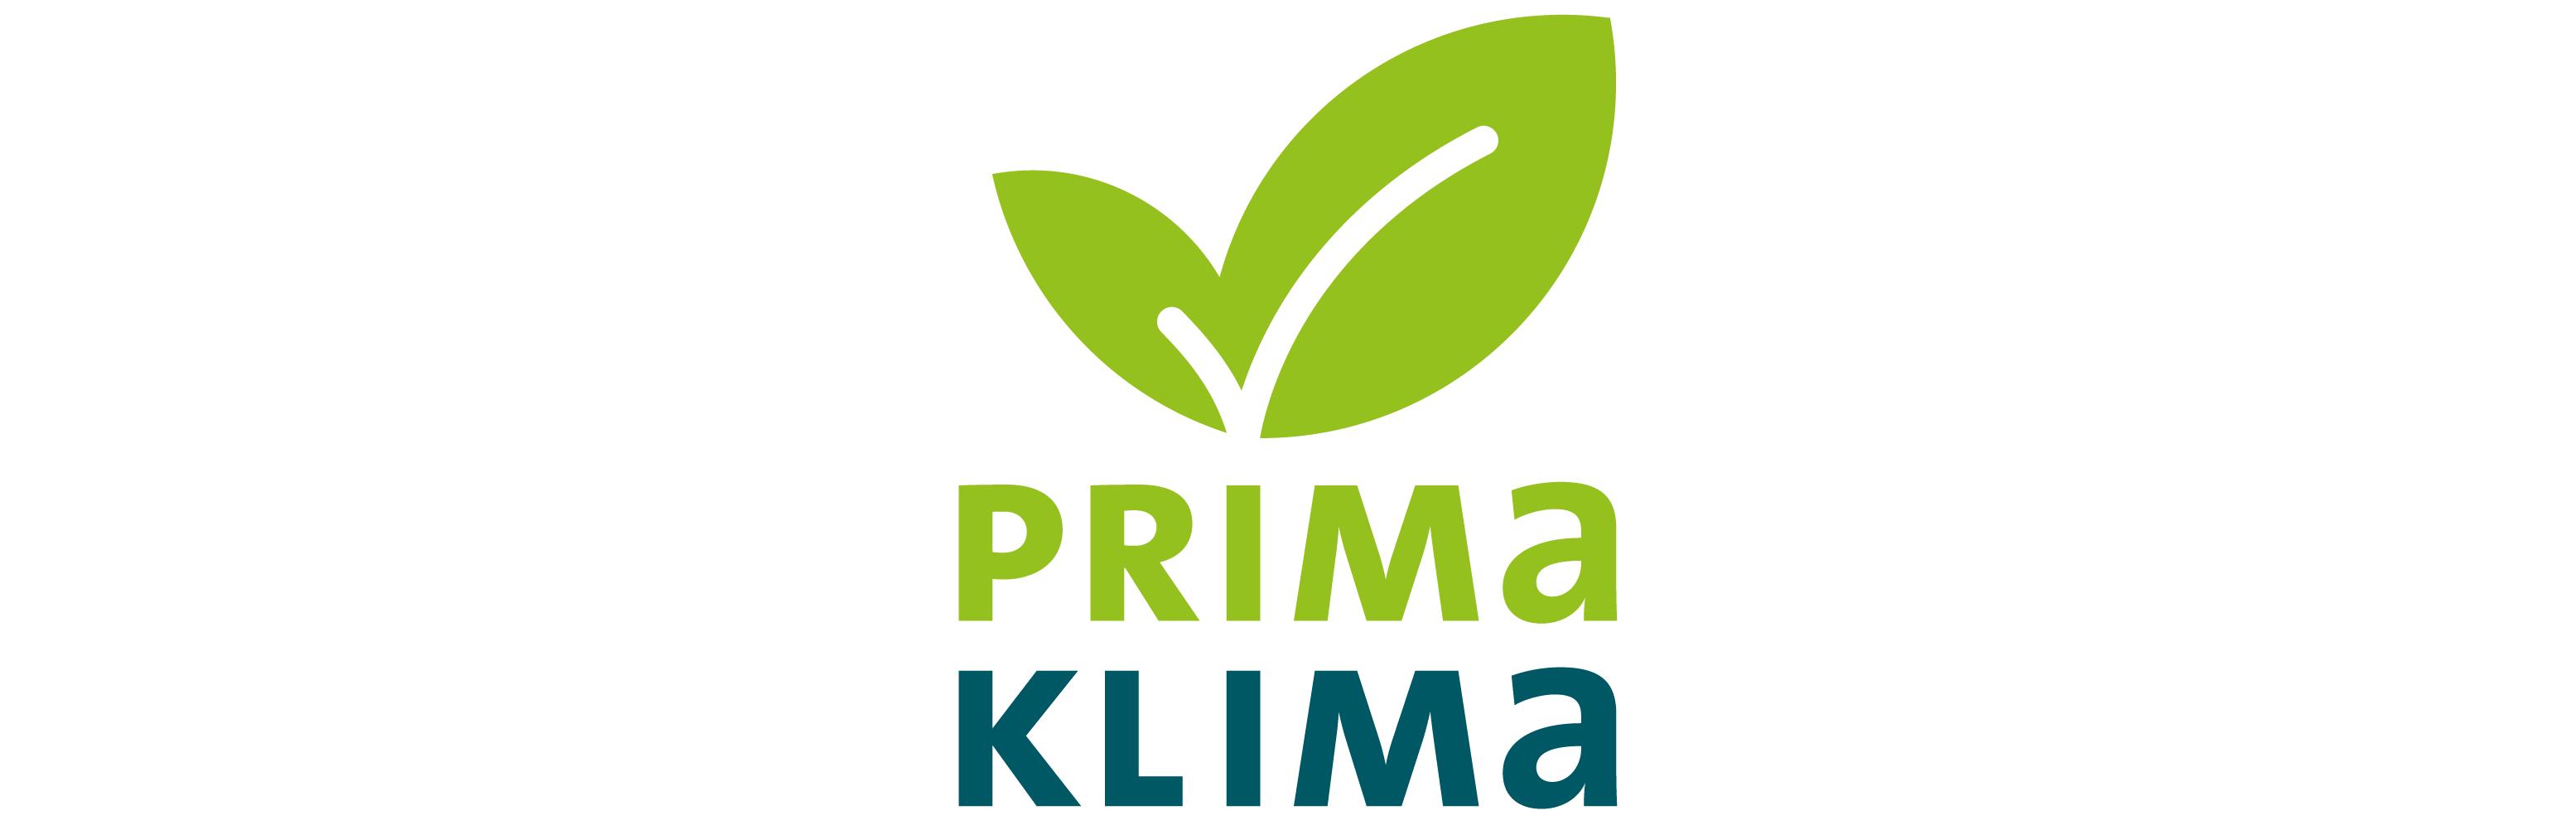 PRIMAKLIMA_Logo_rgblOqCR0INF4v6U